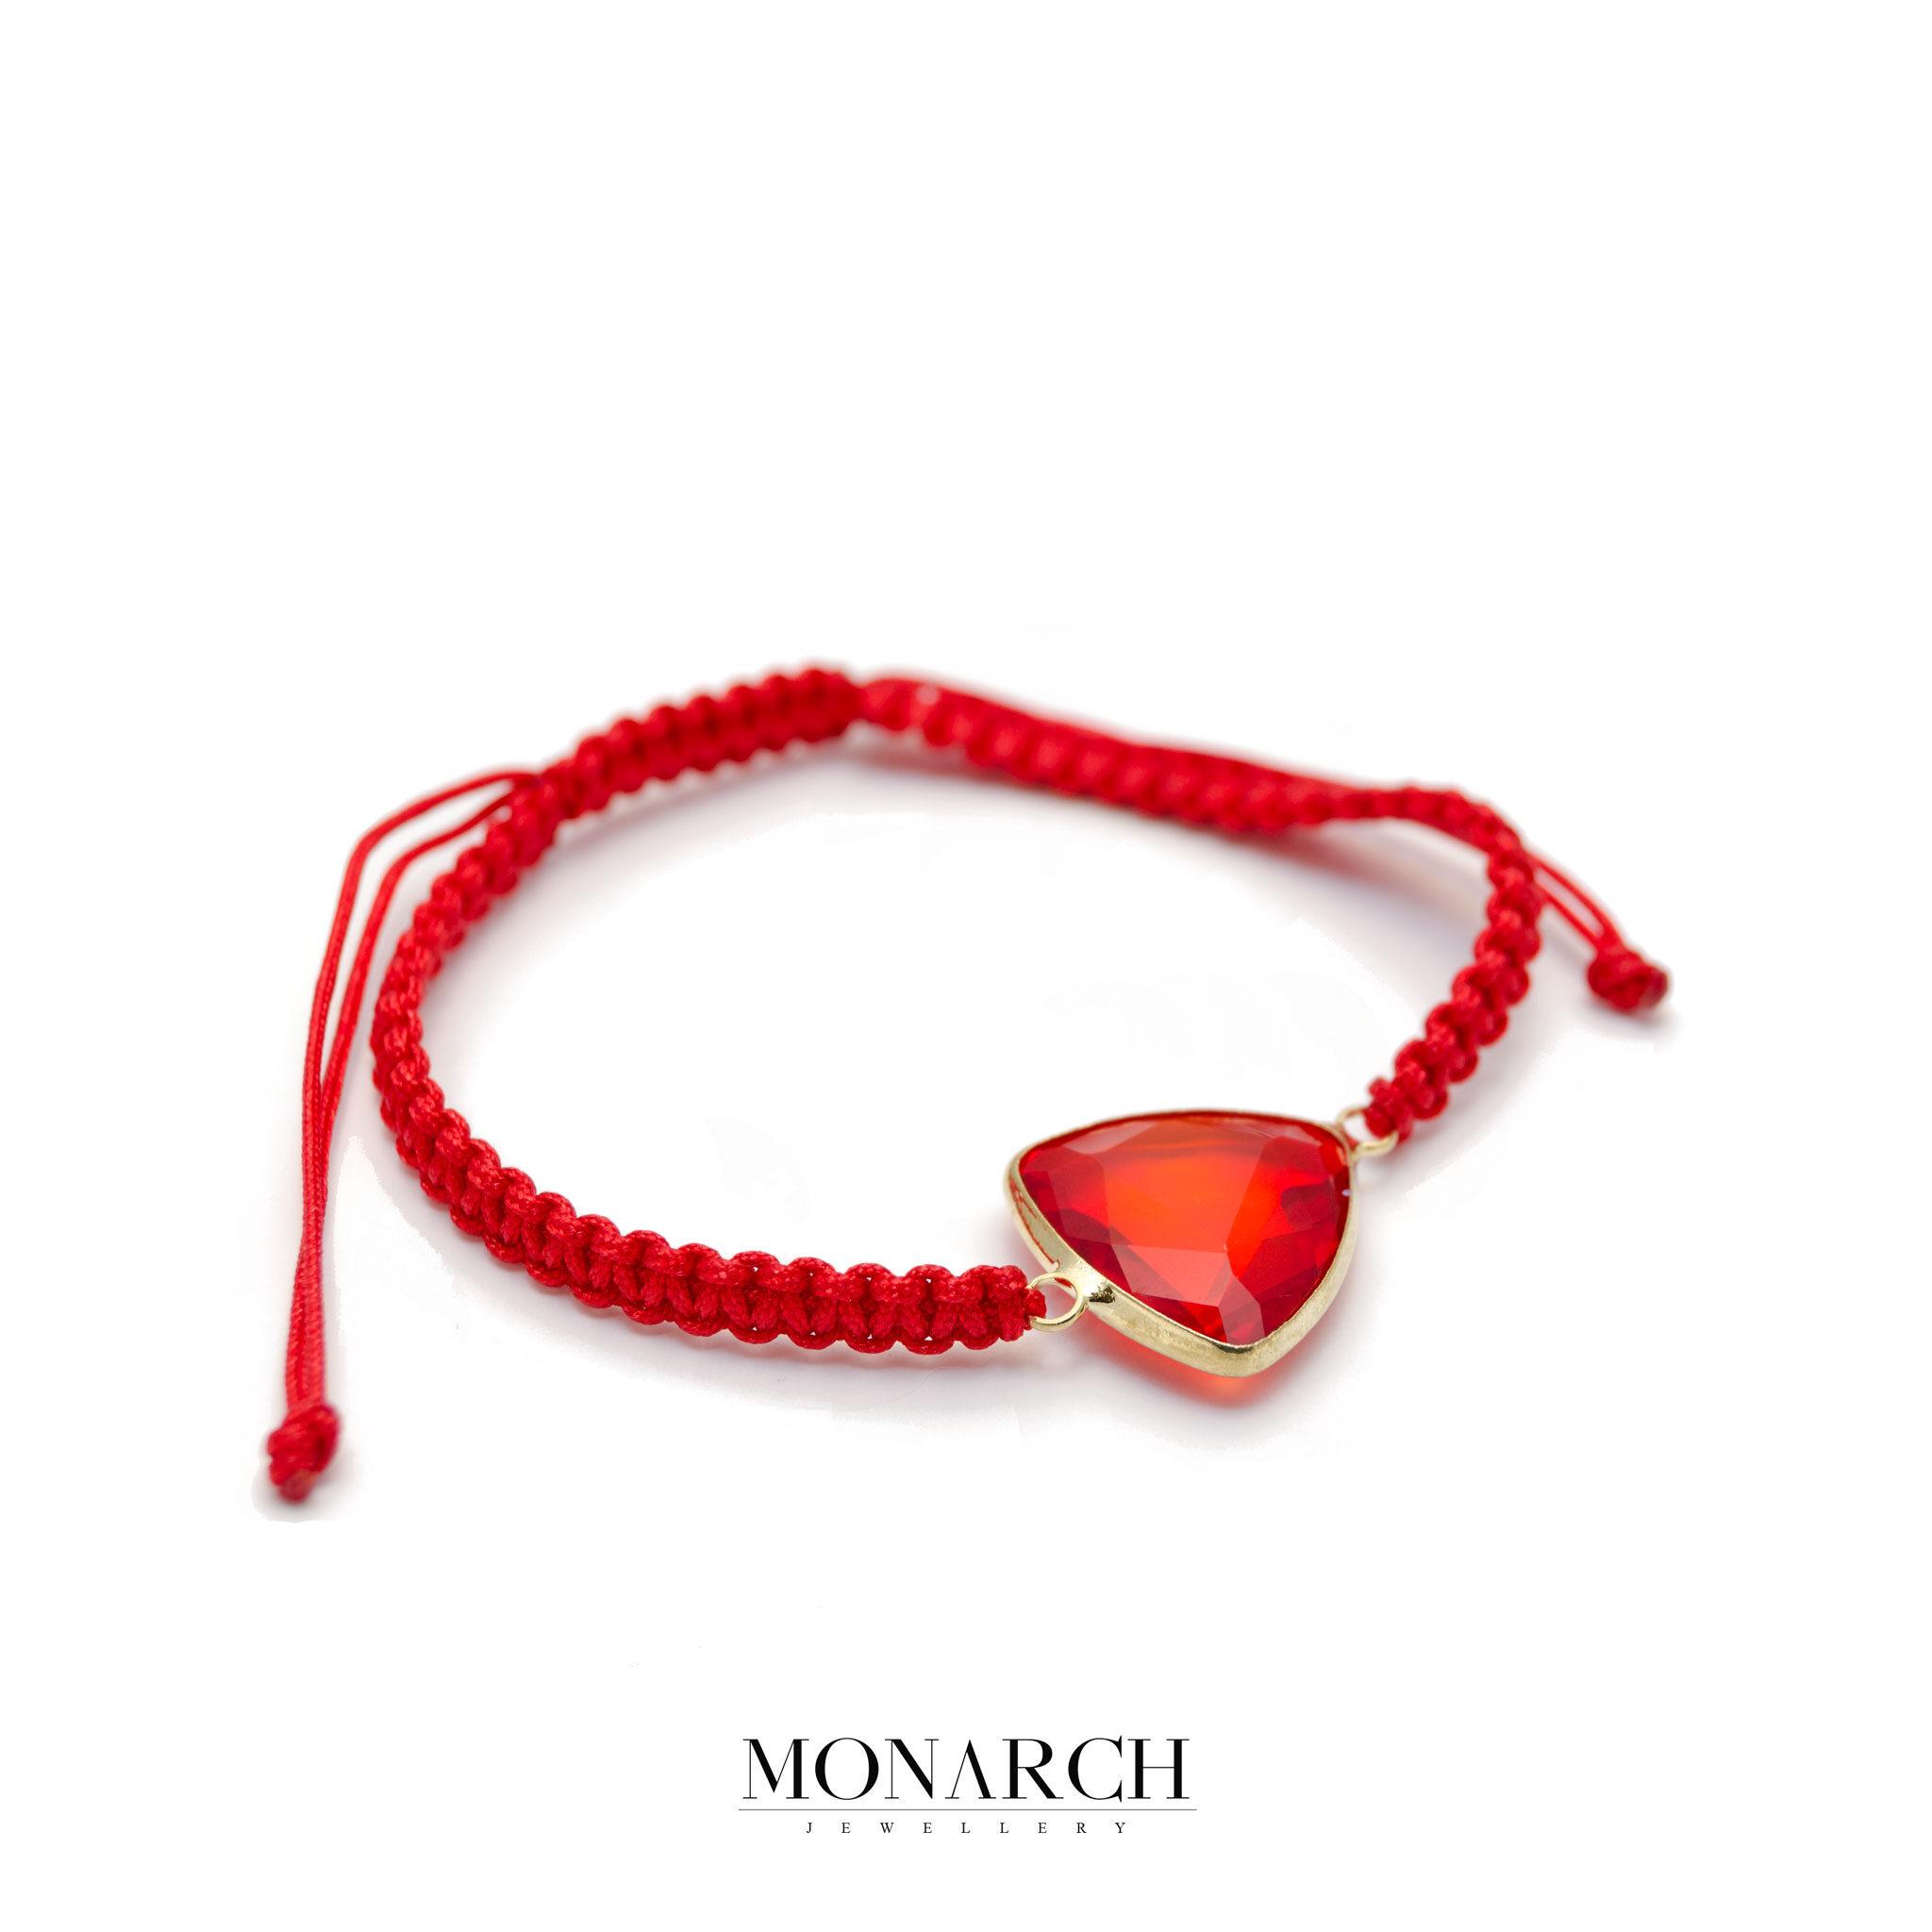 Monarch Jewellery Red Dragon Stone Limited Macrame Bracelet